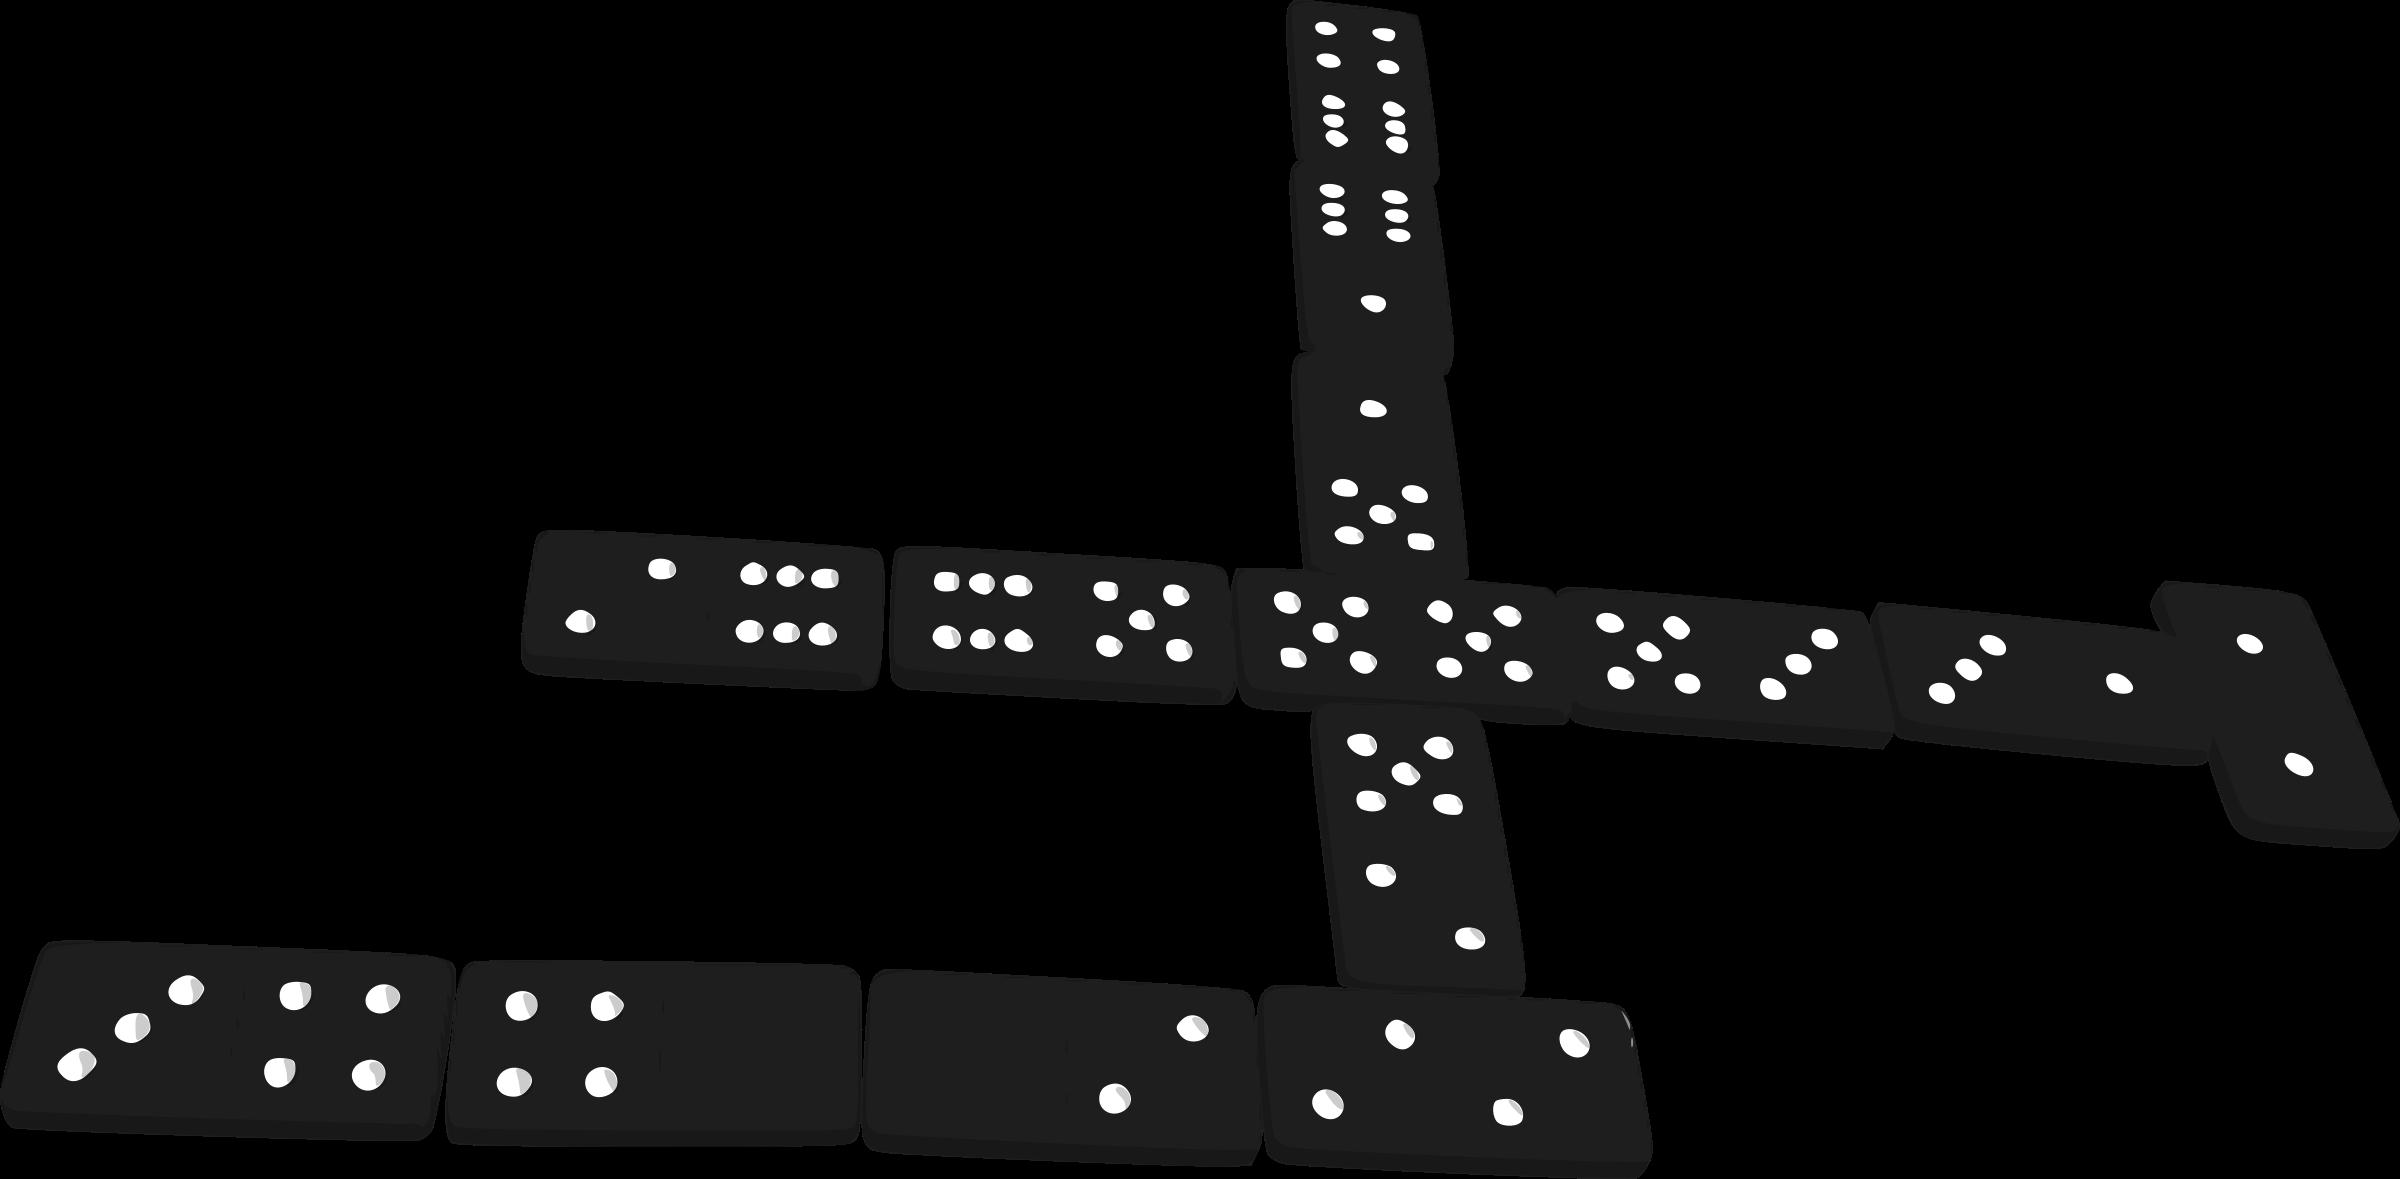 clip royalty free Tiled dominoes big image. Domino clipart dominoe